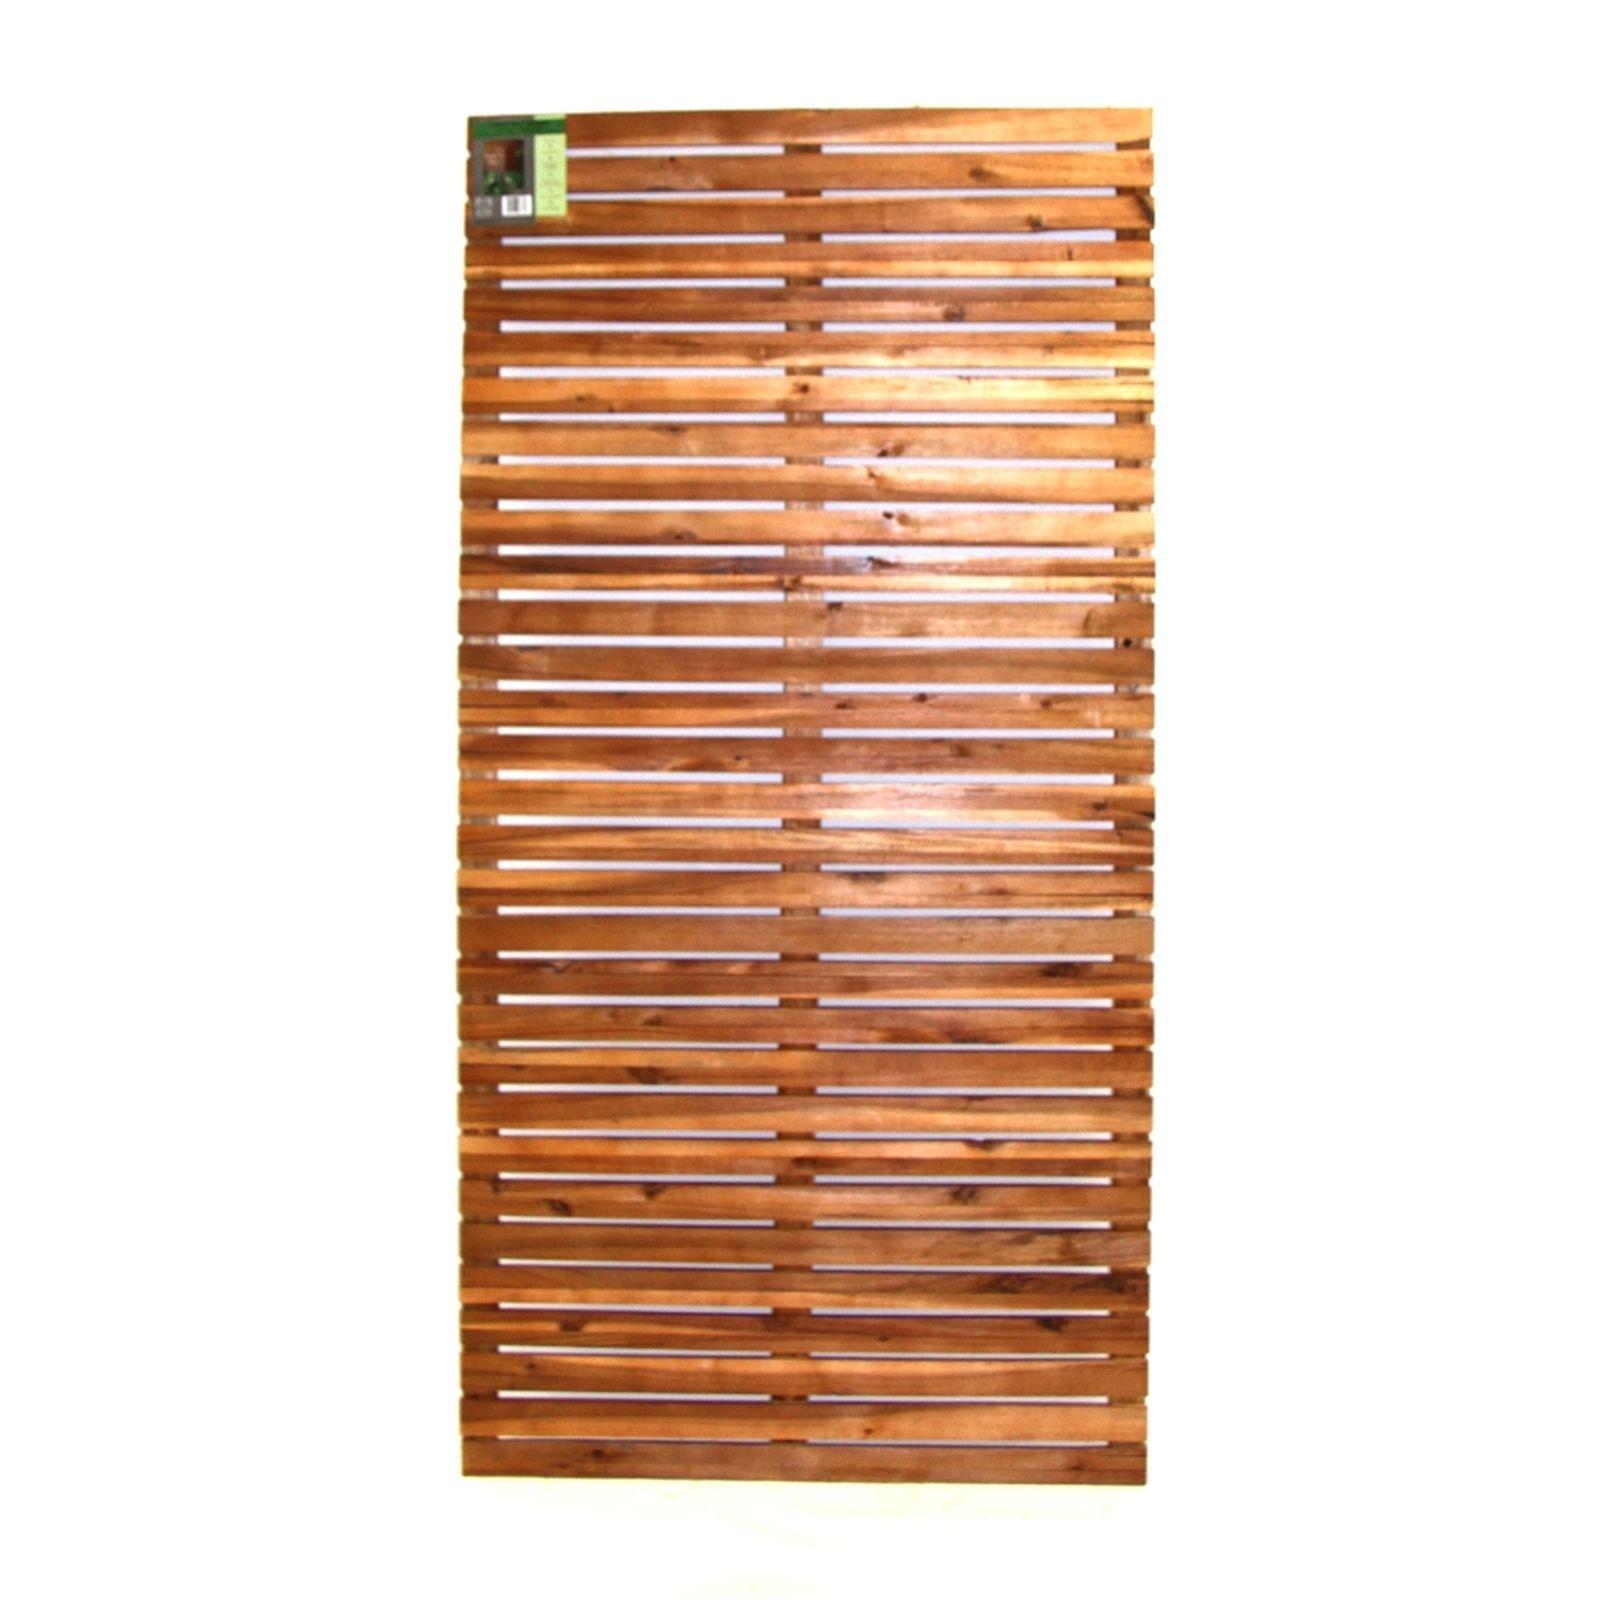 Lattice Makers 1800 X 900mm Timber Vertical Slat Screen